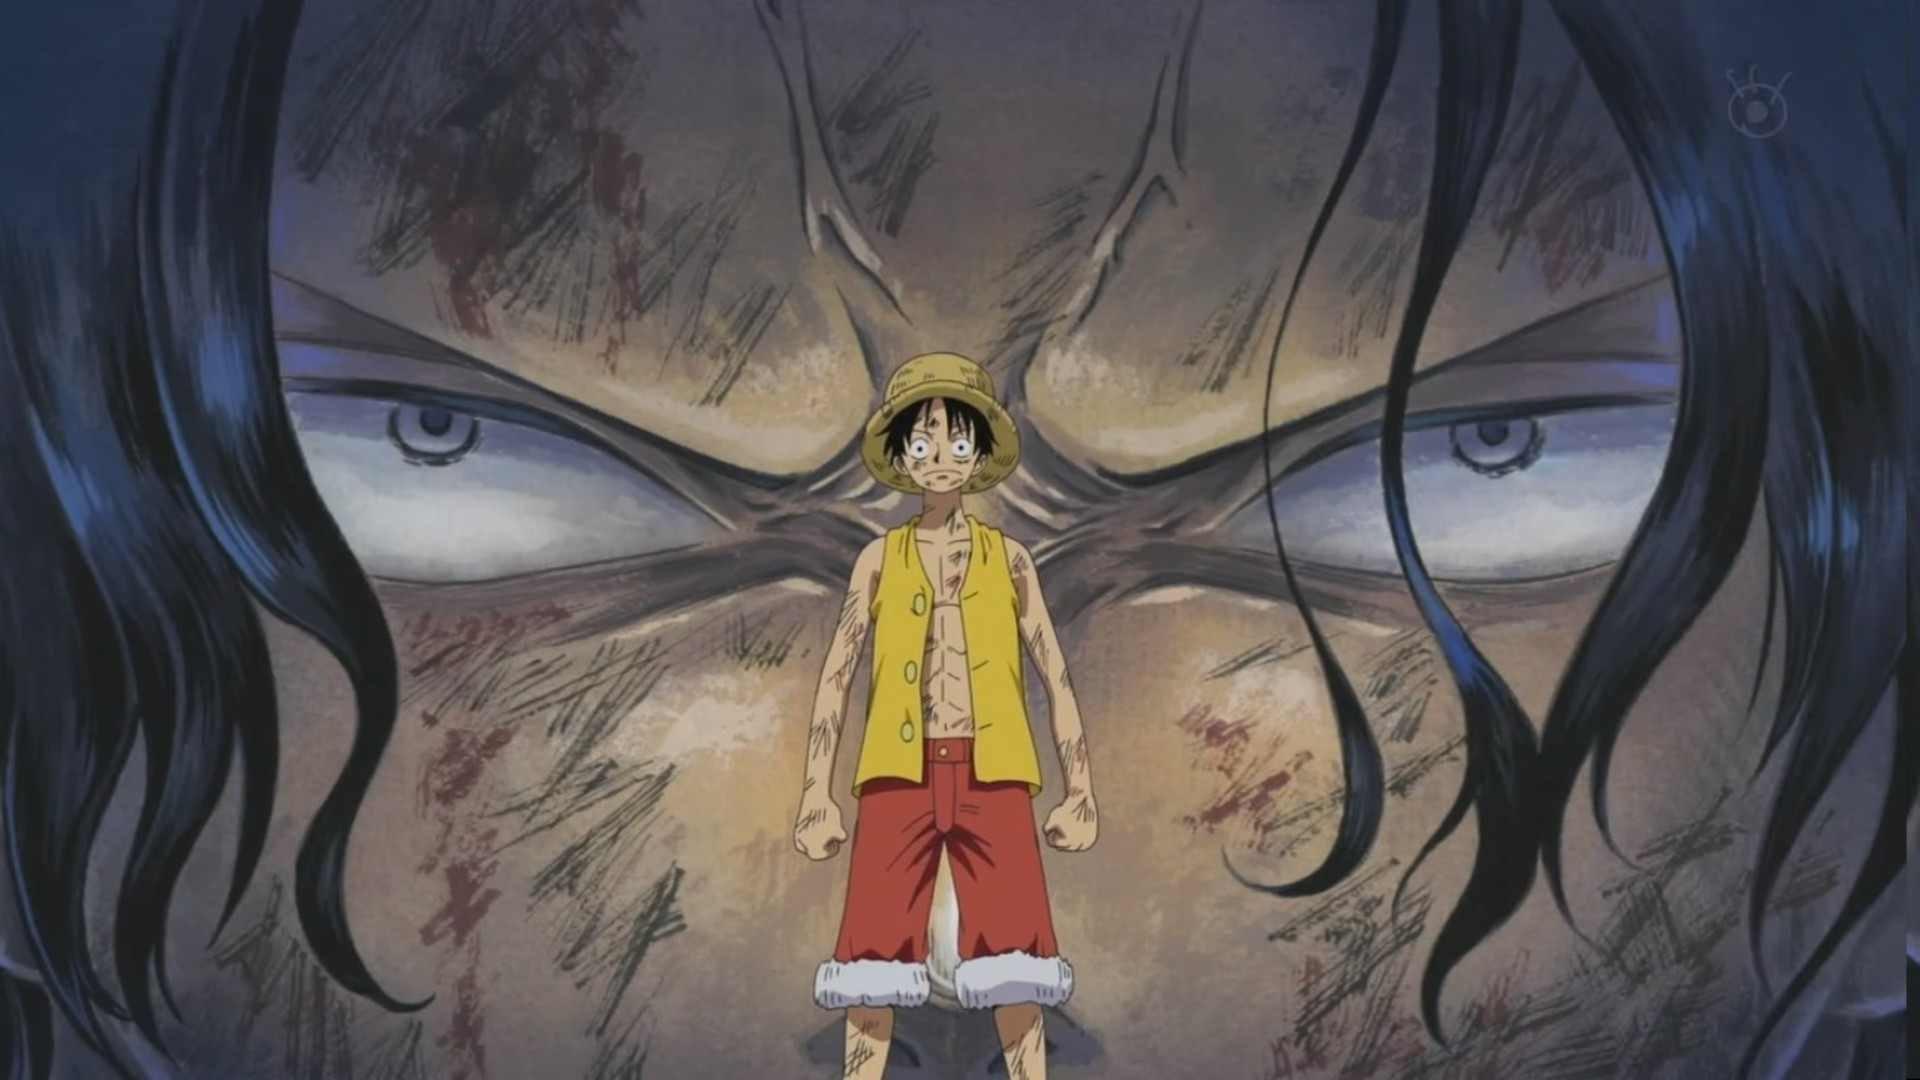 One Piece (anime) Ace Monkey D Luffy wallpaper | 1920x1080 | 235055 ...